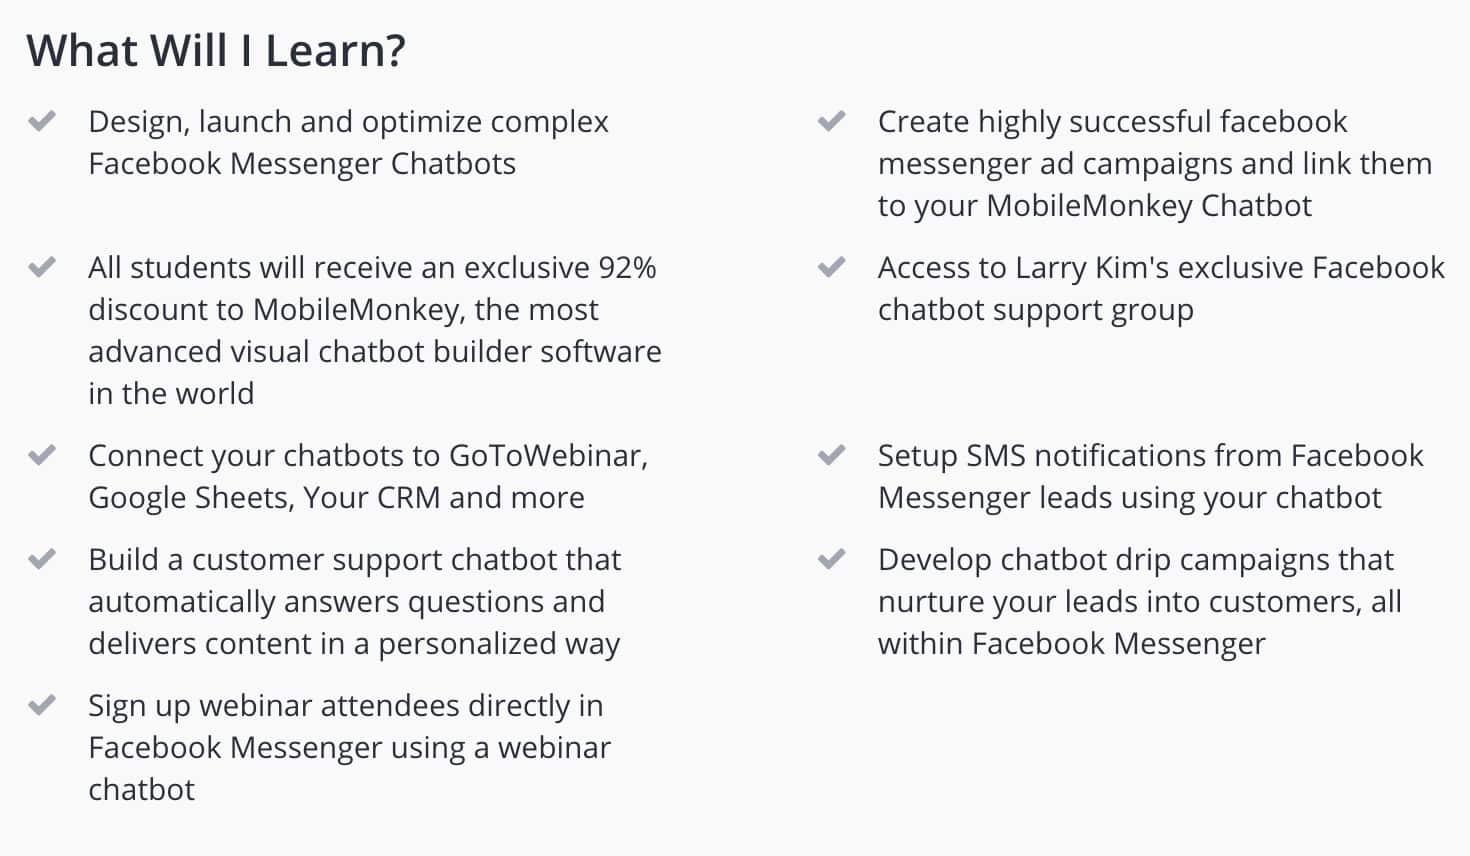 95% Off Facebook Marketing - Build Facebook Messenger Chatbots course